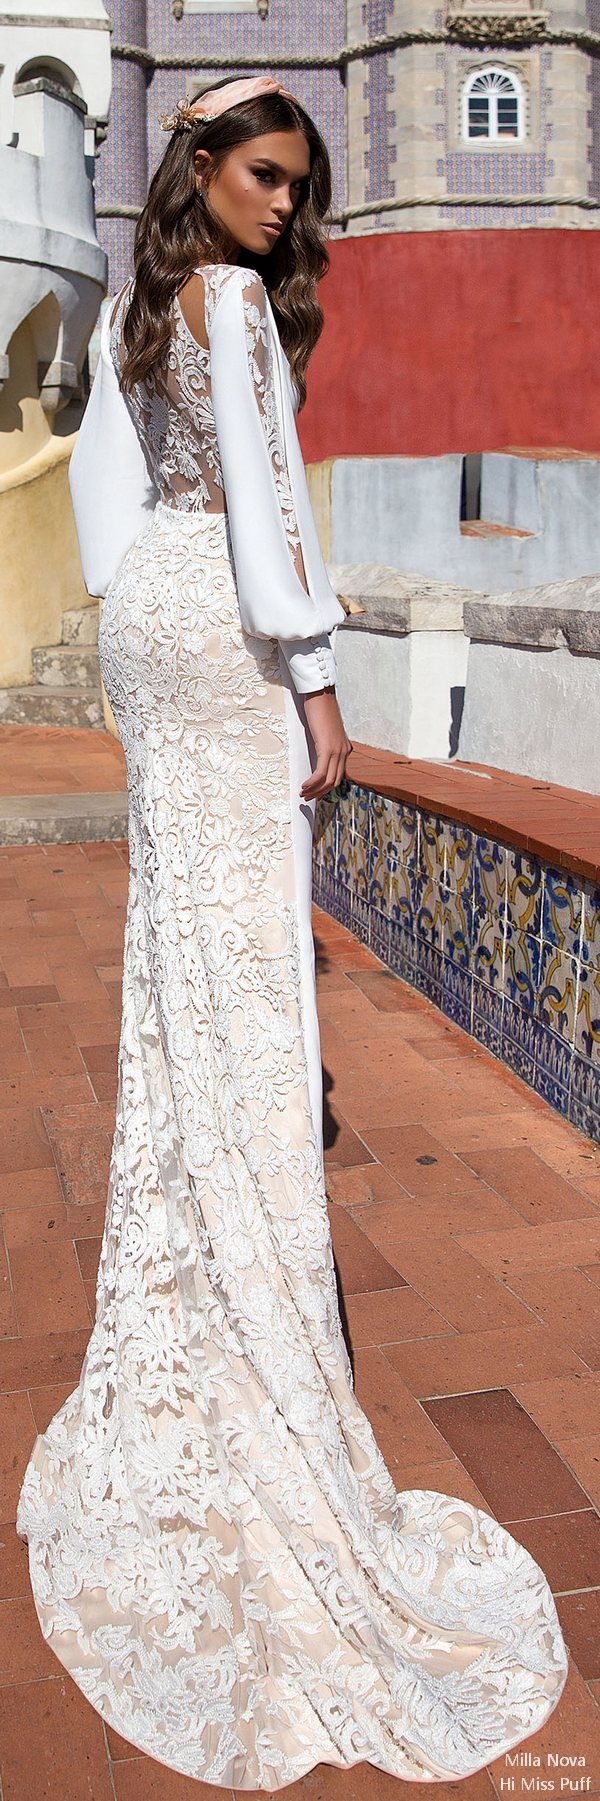 Milla nova sintra holidays wedding dresses wedding